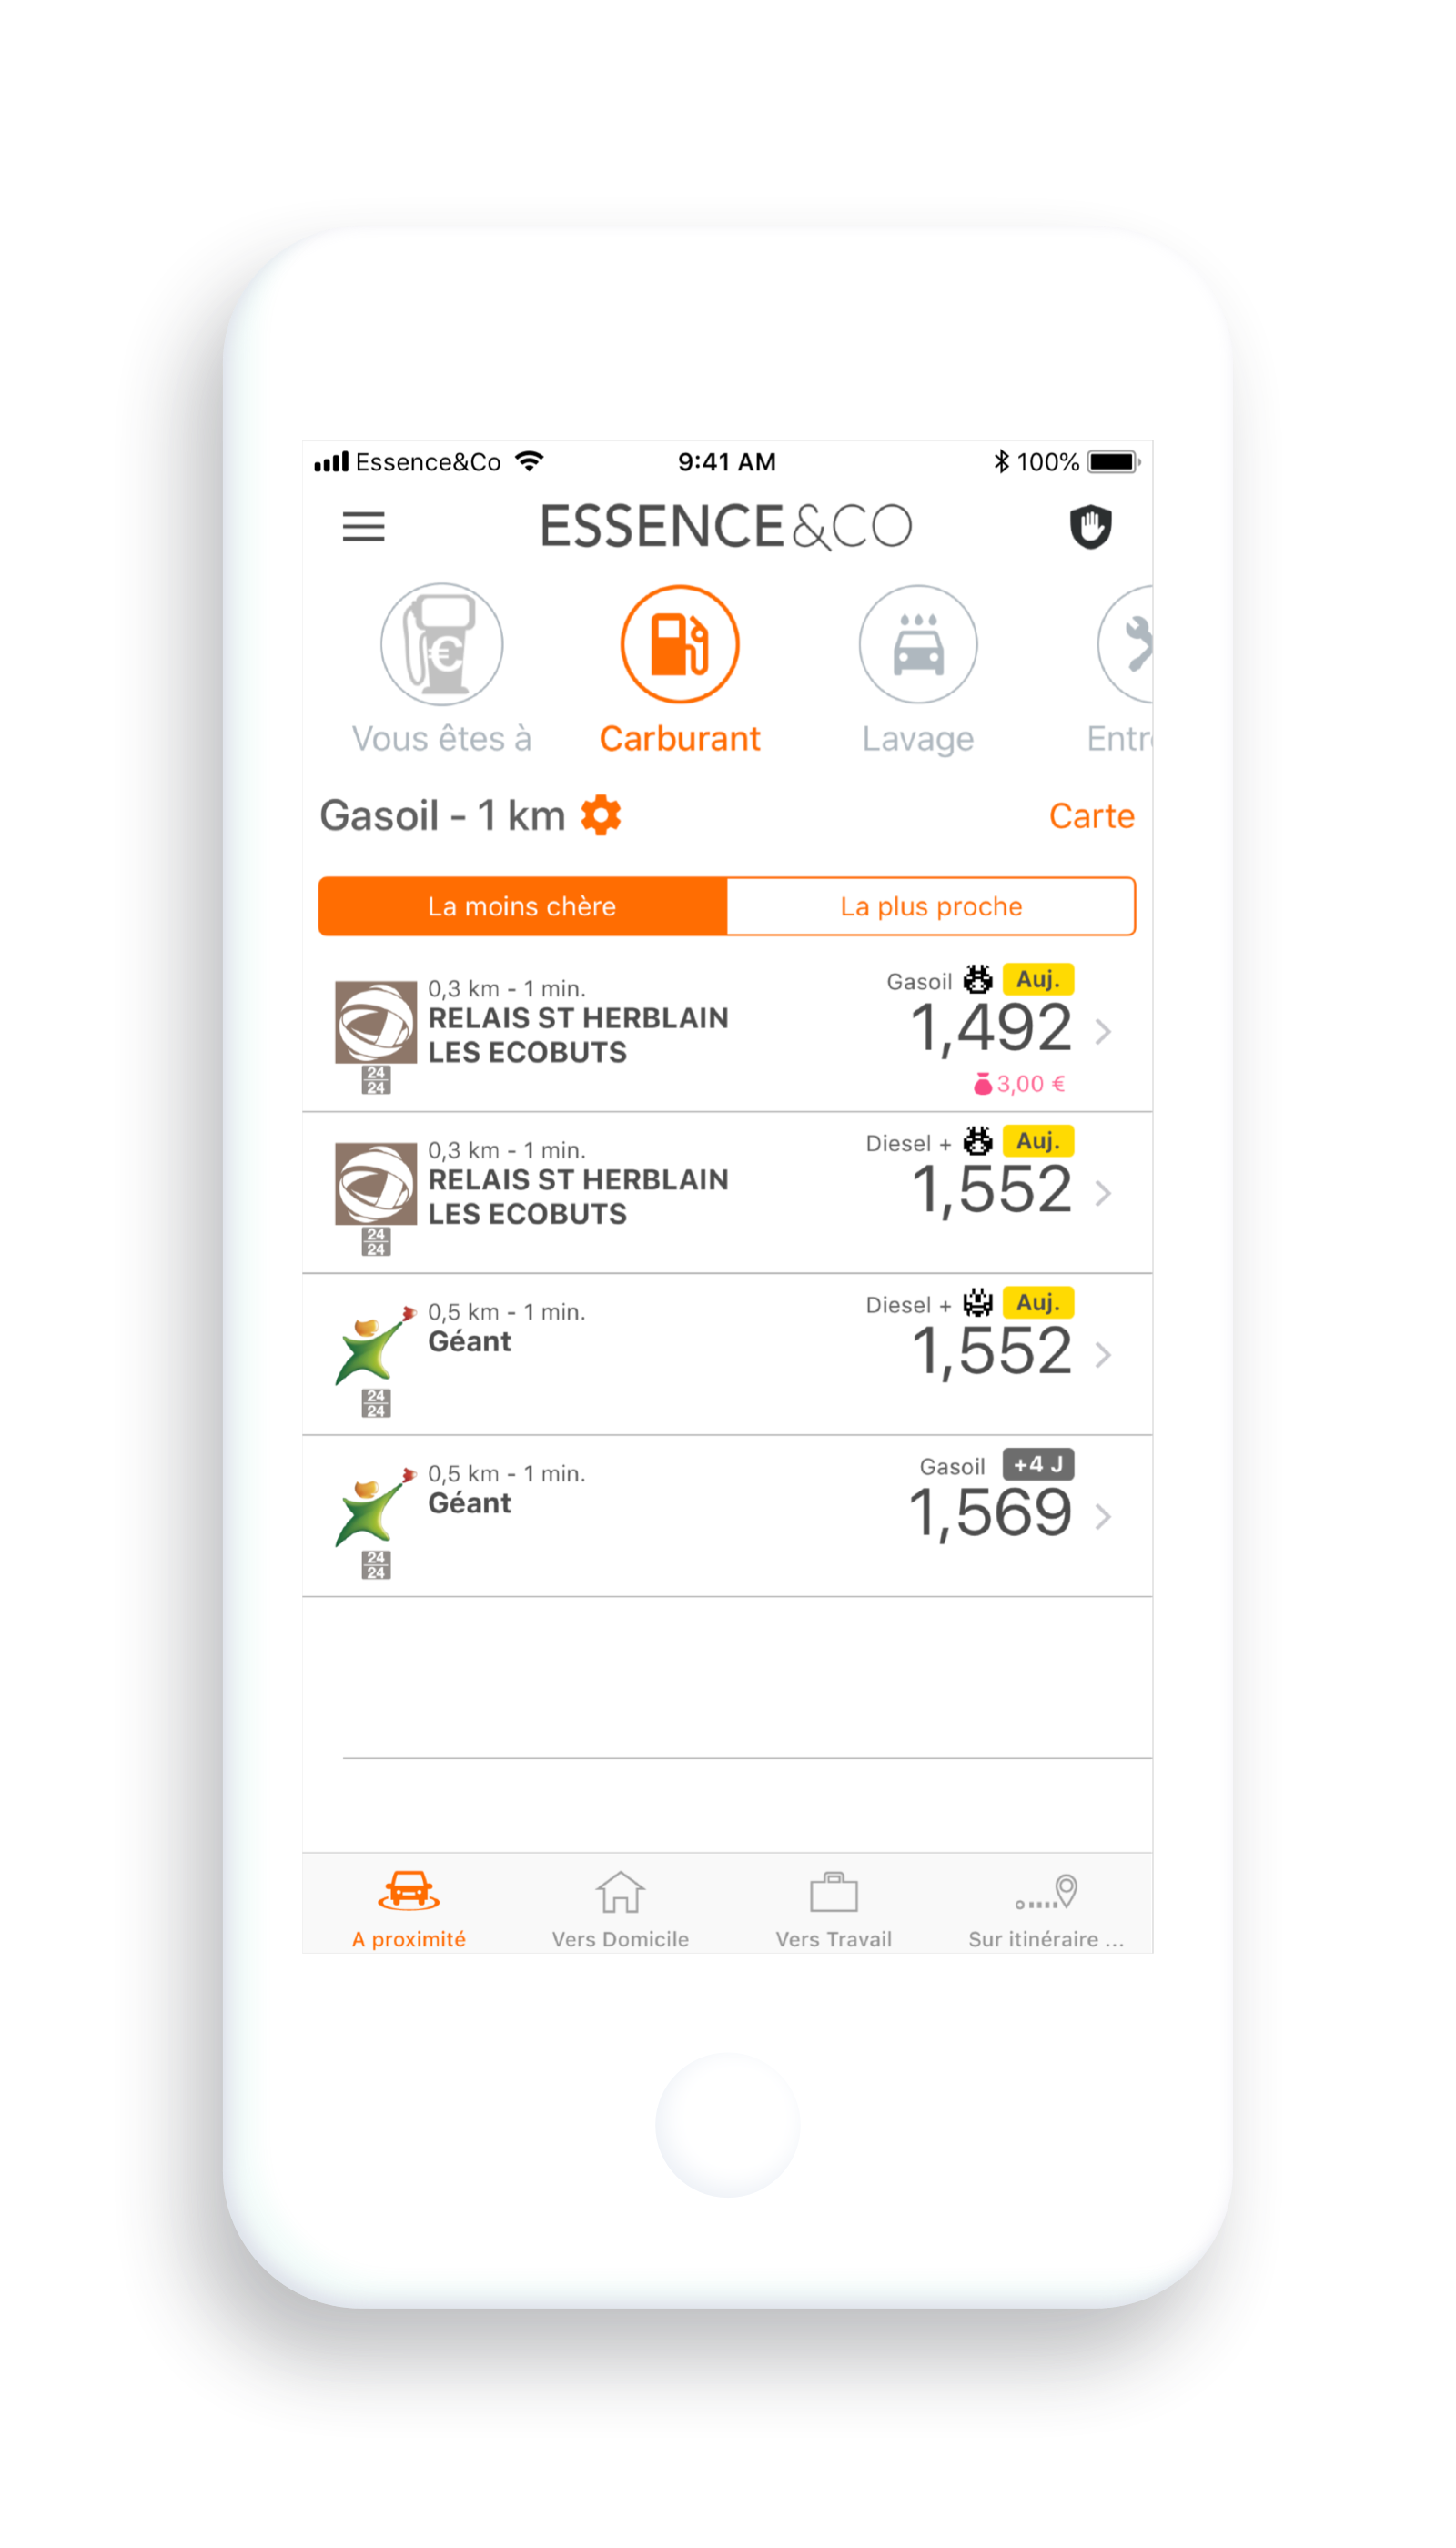 ripplemotion-projet-screen-app-essence&co